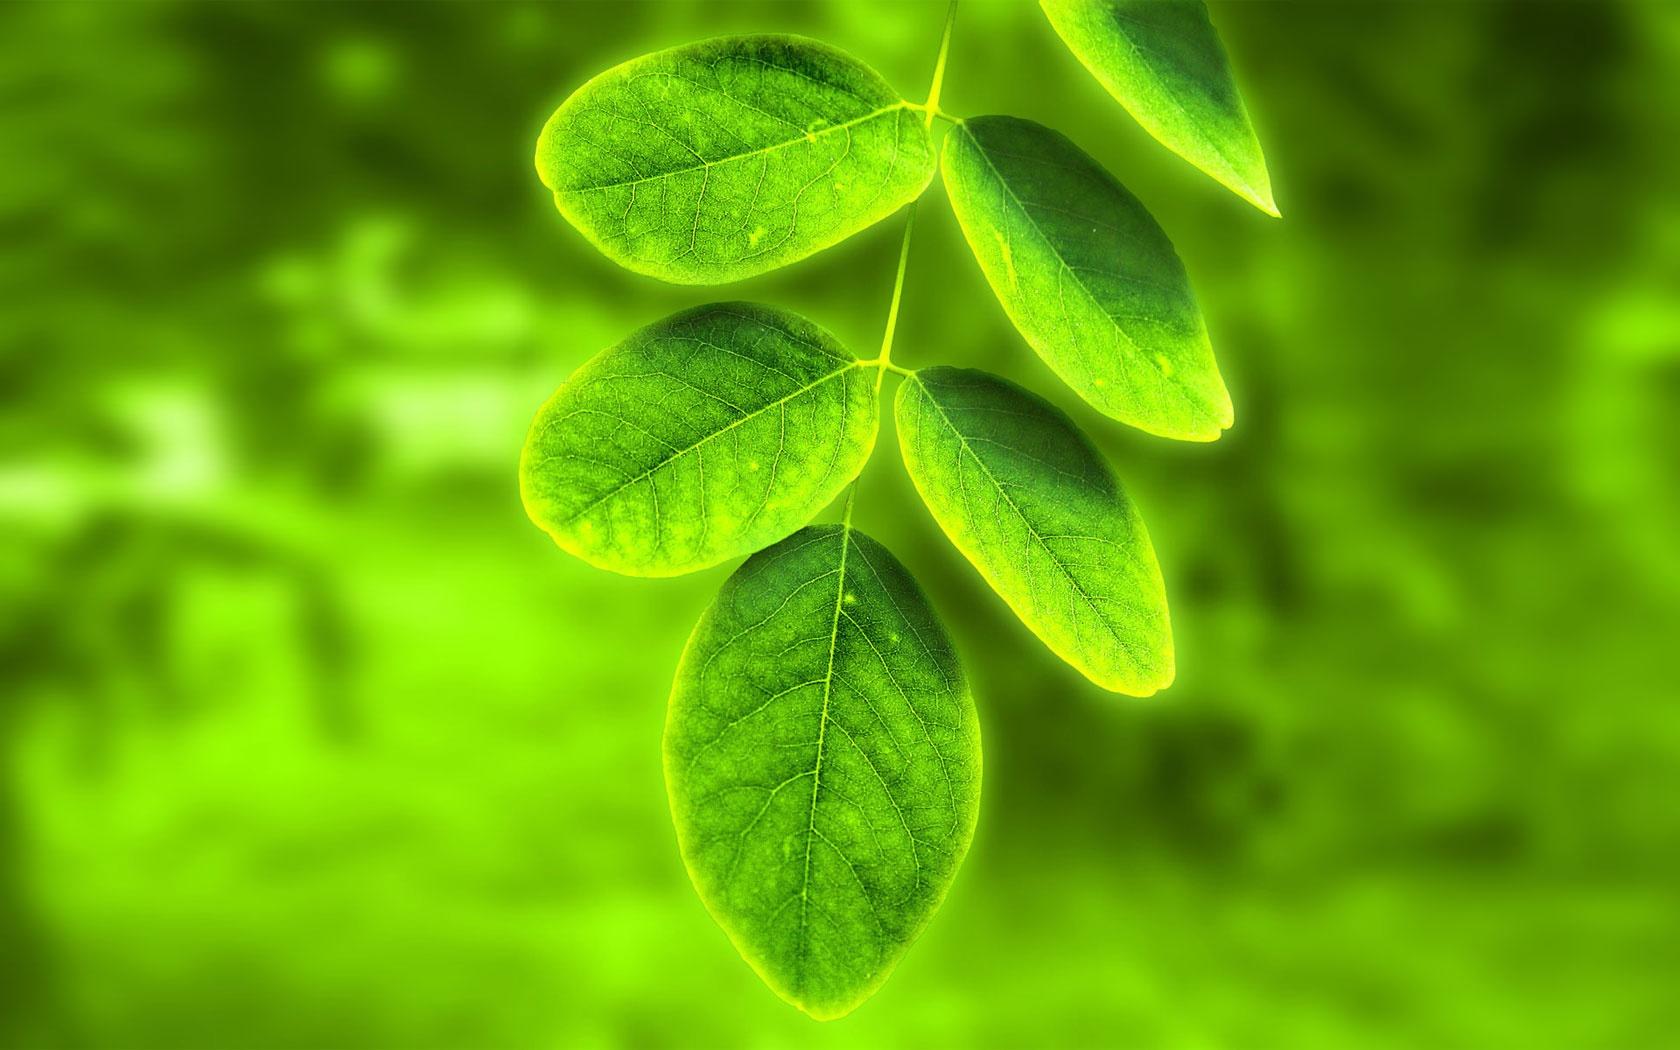 green leaf wallpaper image - photo #44